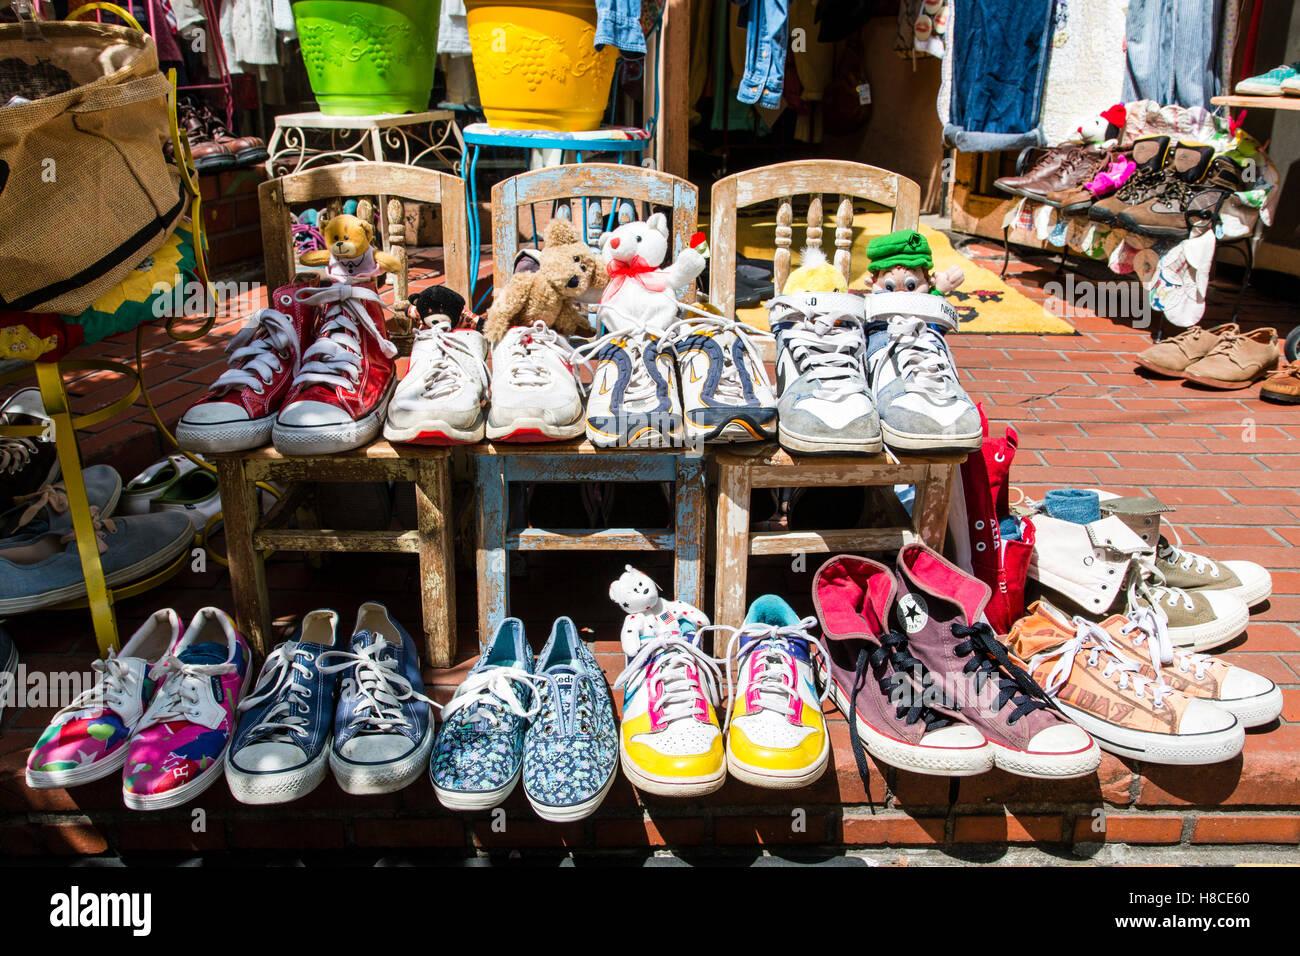 Japan, Tokyo, Harajuku, Takeshita-dori. Panama Boy used, 2nd hand store. Outside entrance, display of trainers arranged - Stock Image